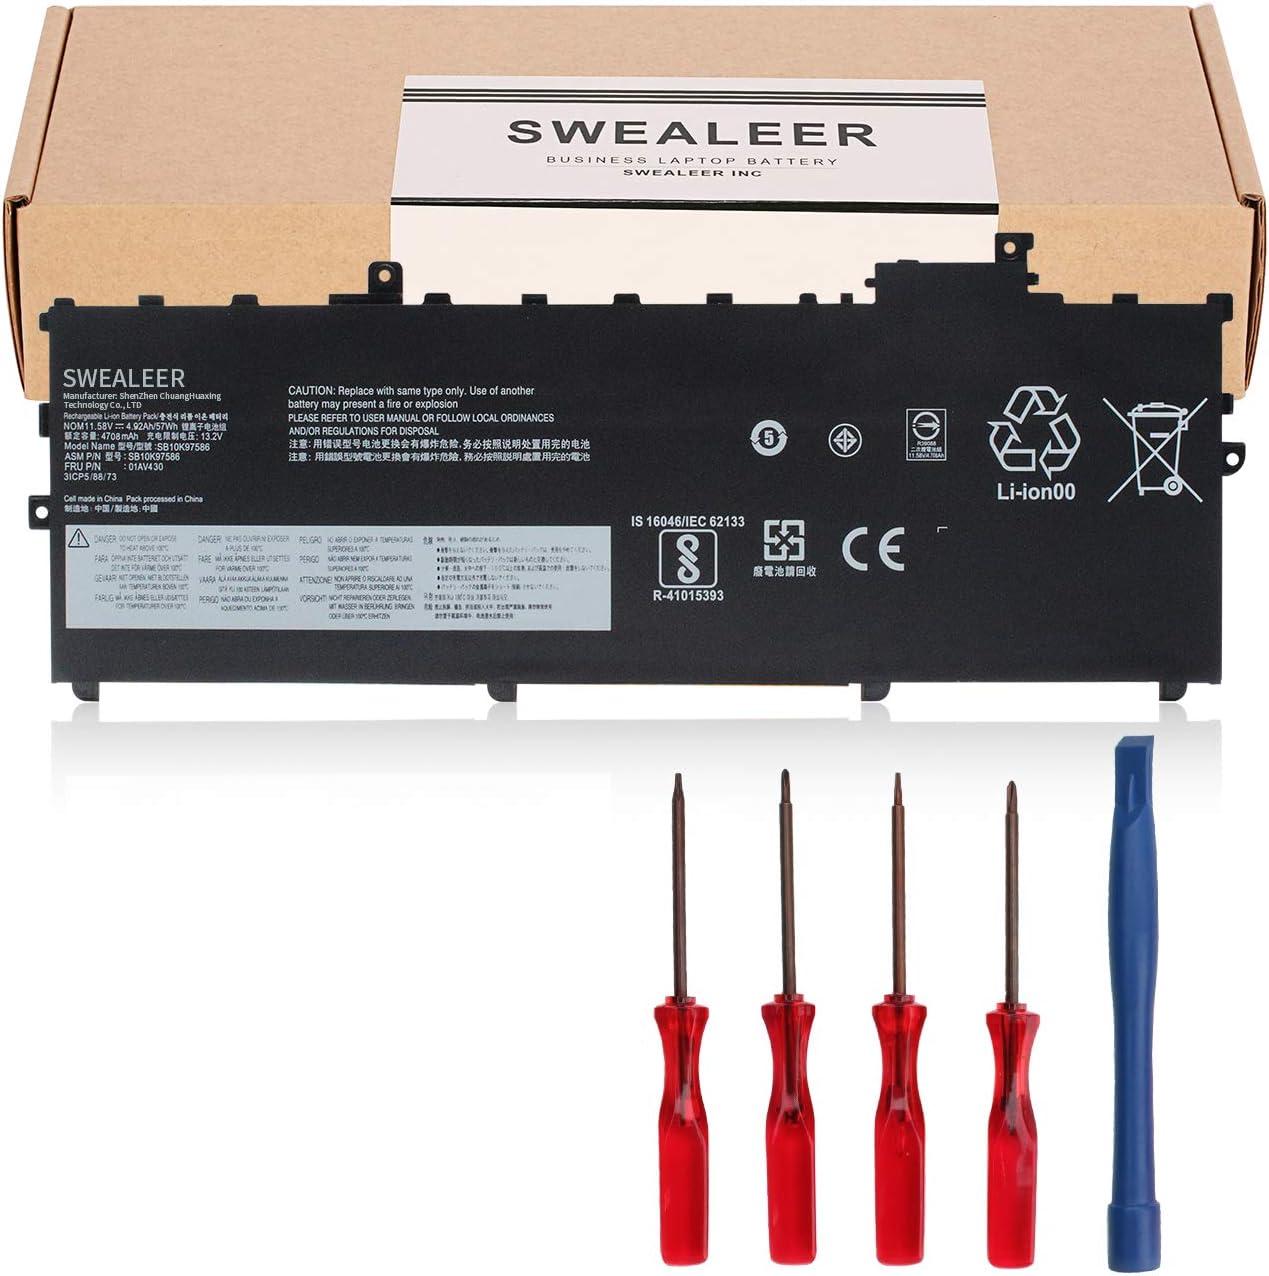 SWEALEER 01AV430 Laptop Battery Compatible with Lenovo ThinkPad X1 Carbon 5th Gen 2017 6th Gen 2018 Series SB10K97587 01AV431 SB10K97588 01AV494 SB10K97586 01AV429 SB10K97586 [11.58V 57Wh 4708mAh]